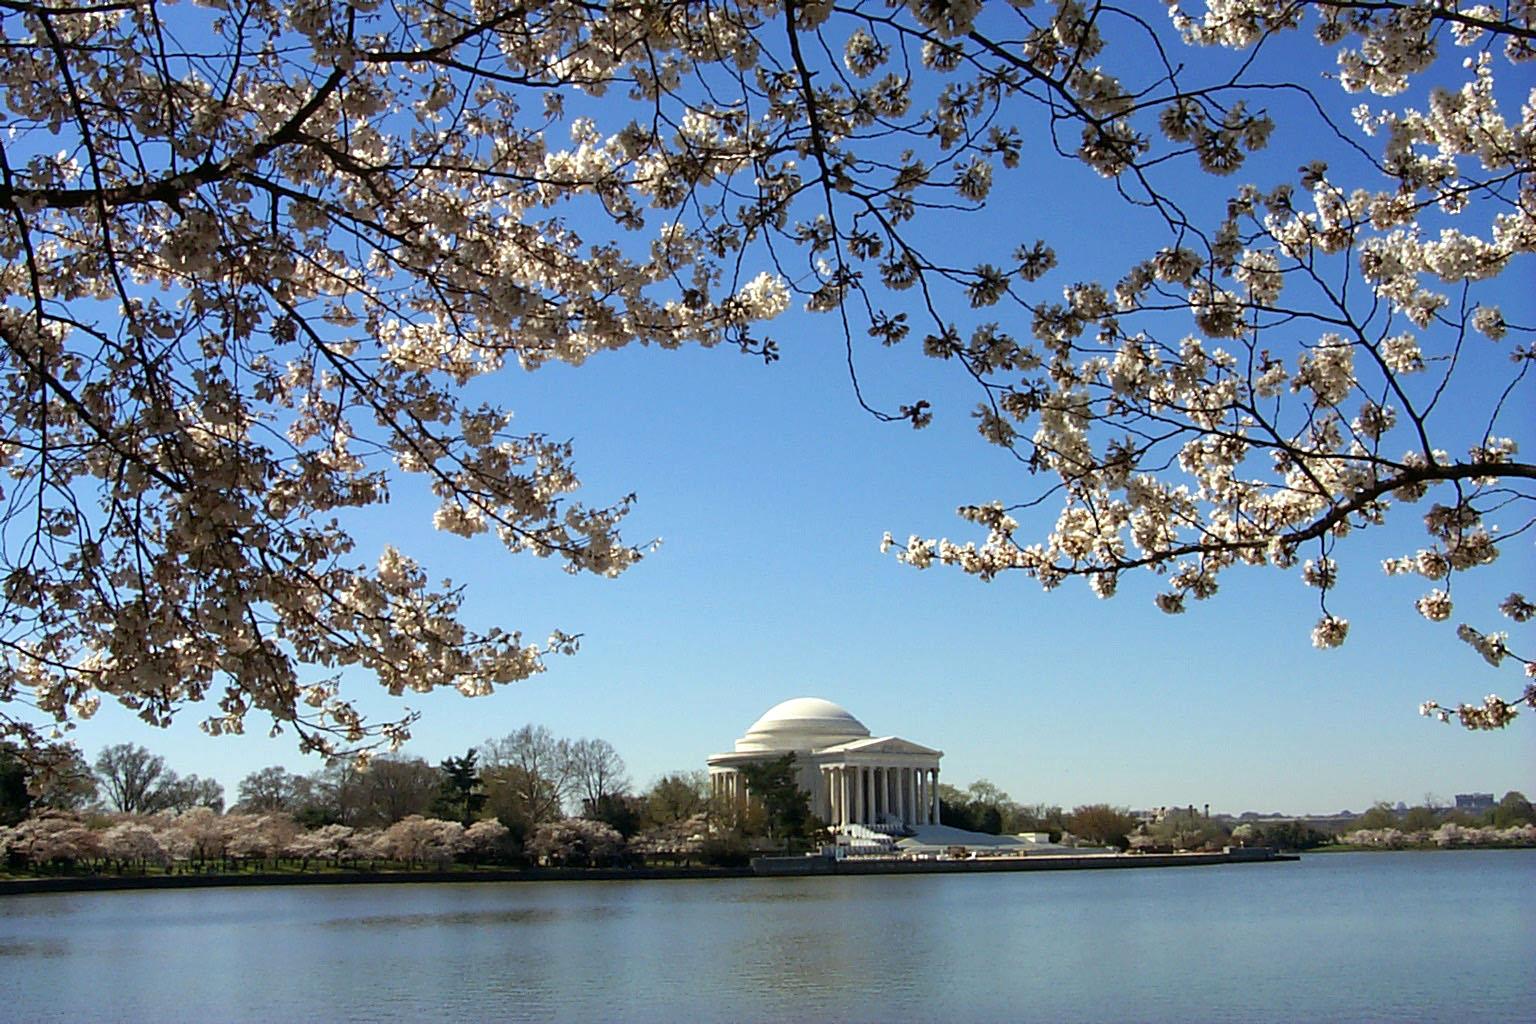 Jefferson Memorial cherry blossoms Patrick Fitzgerald